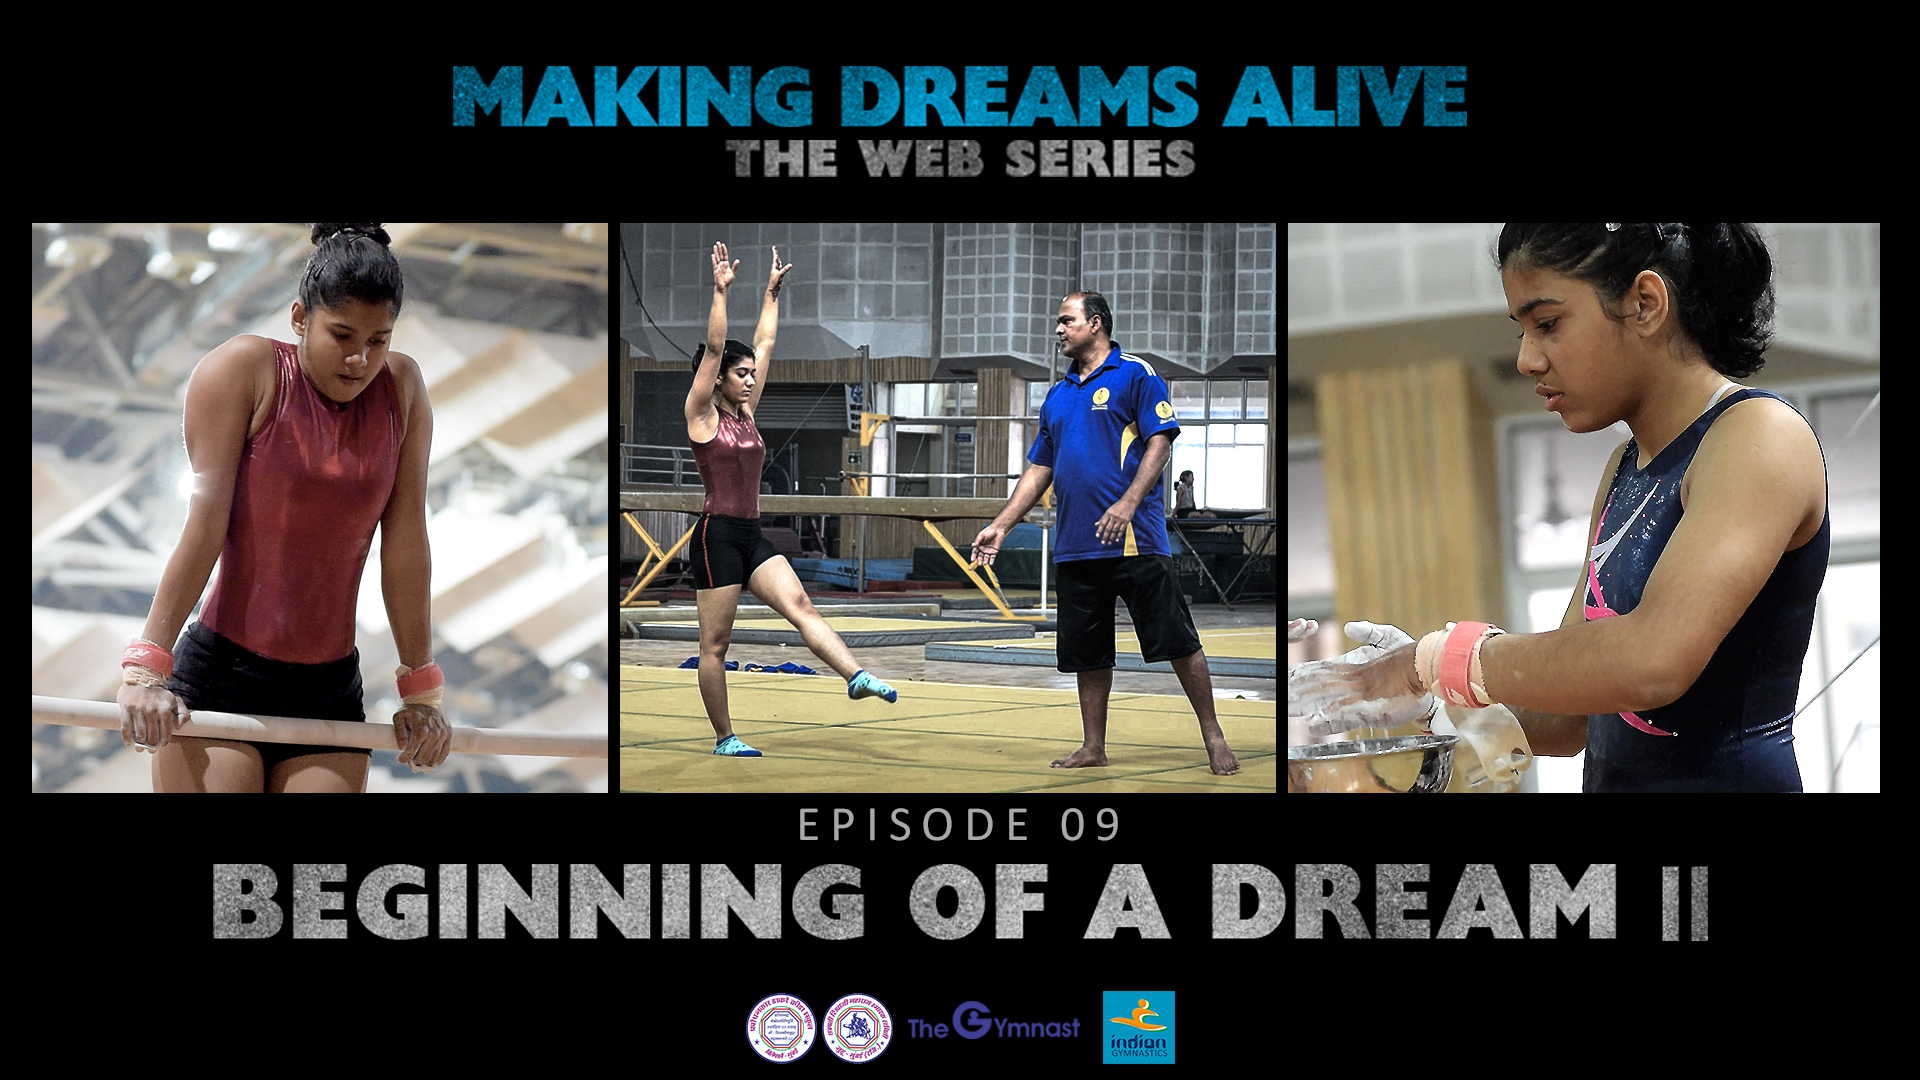 Making Dreams Alive | S01E09 | Beginning of a Dream II